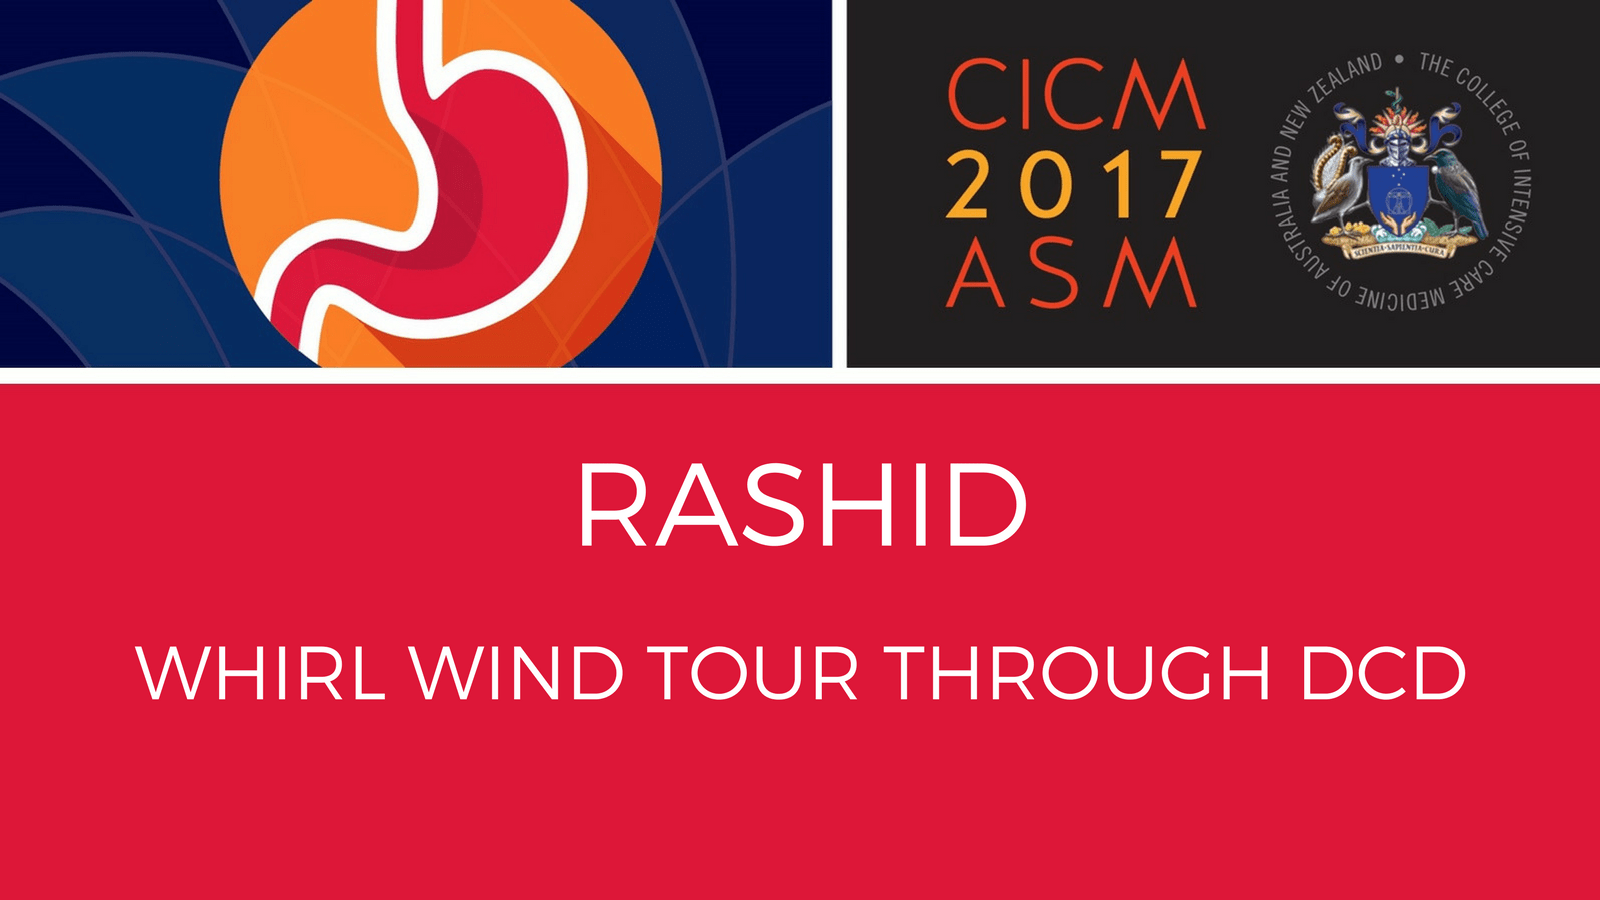 Whirl wind tour through DCD